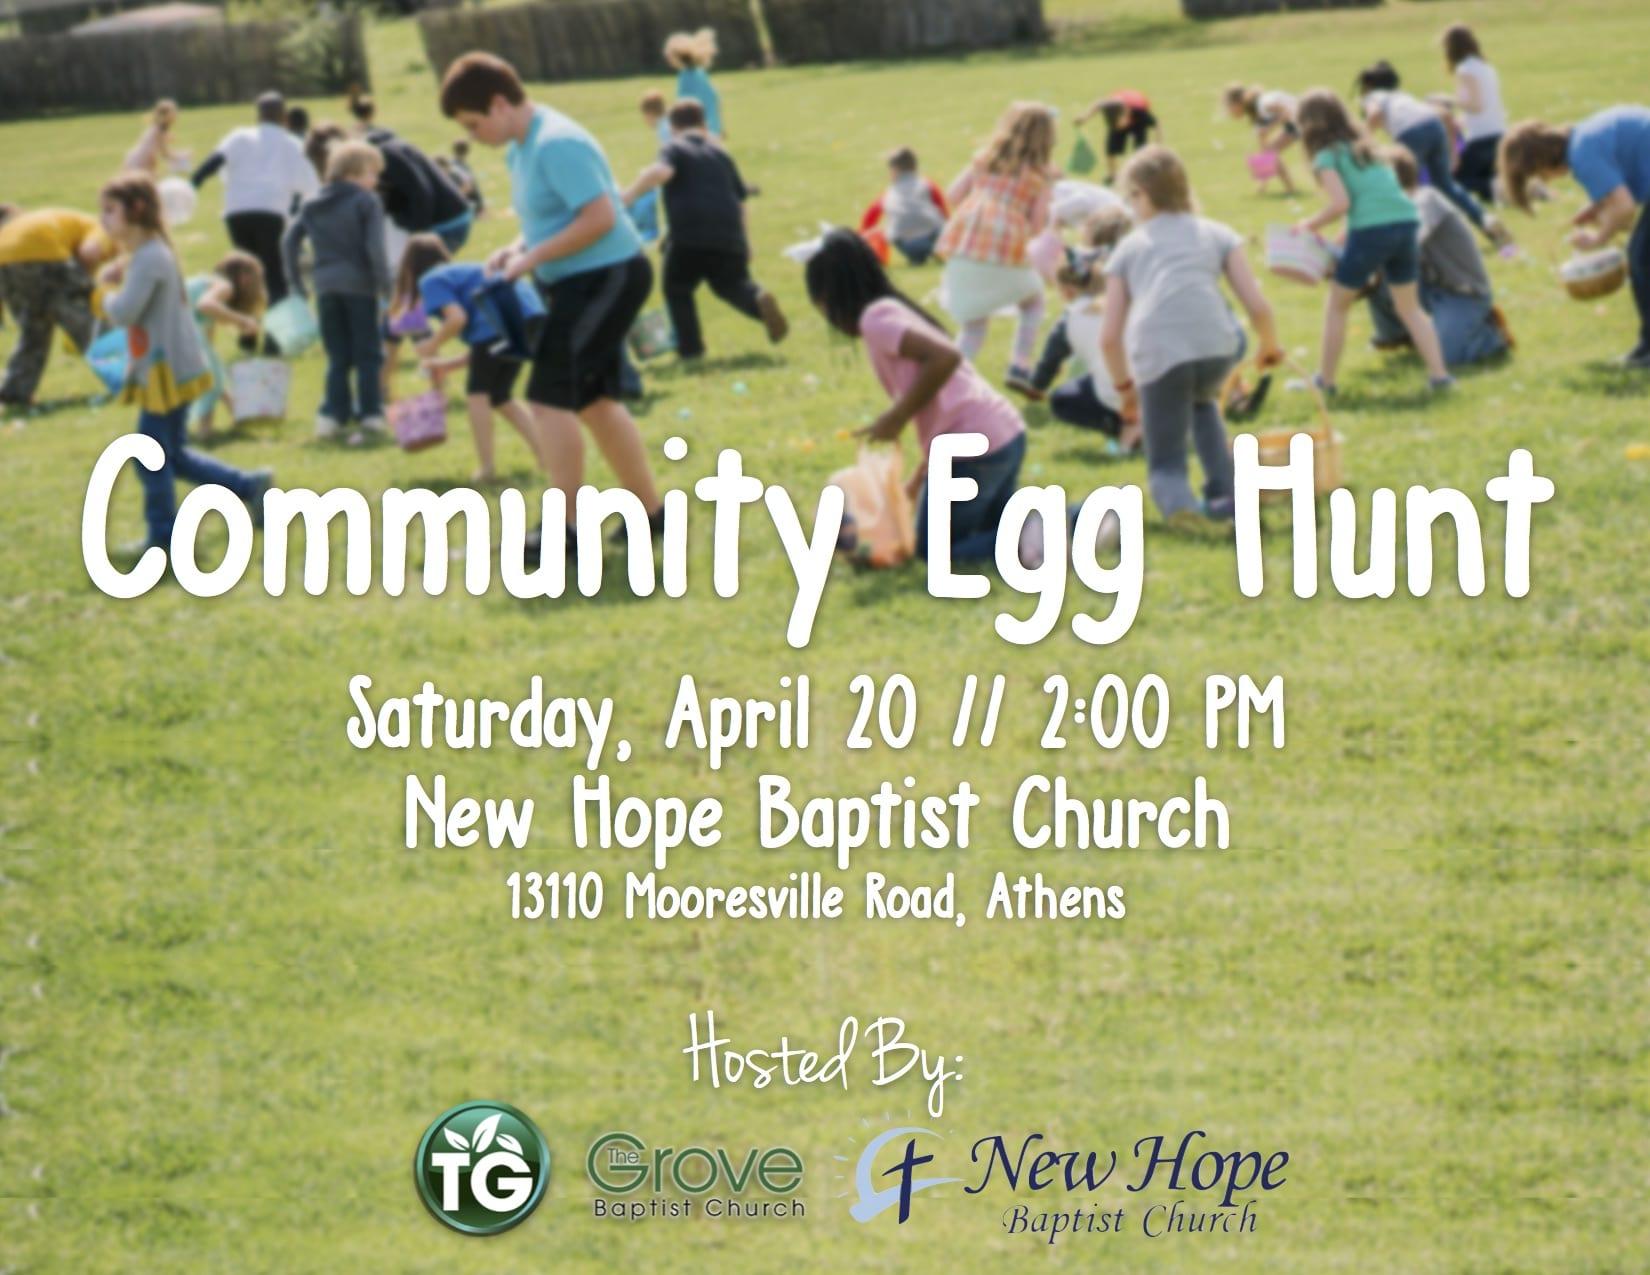 Community Egg Hunt at New Hope Baptist